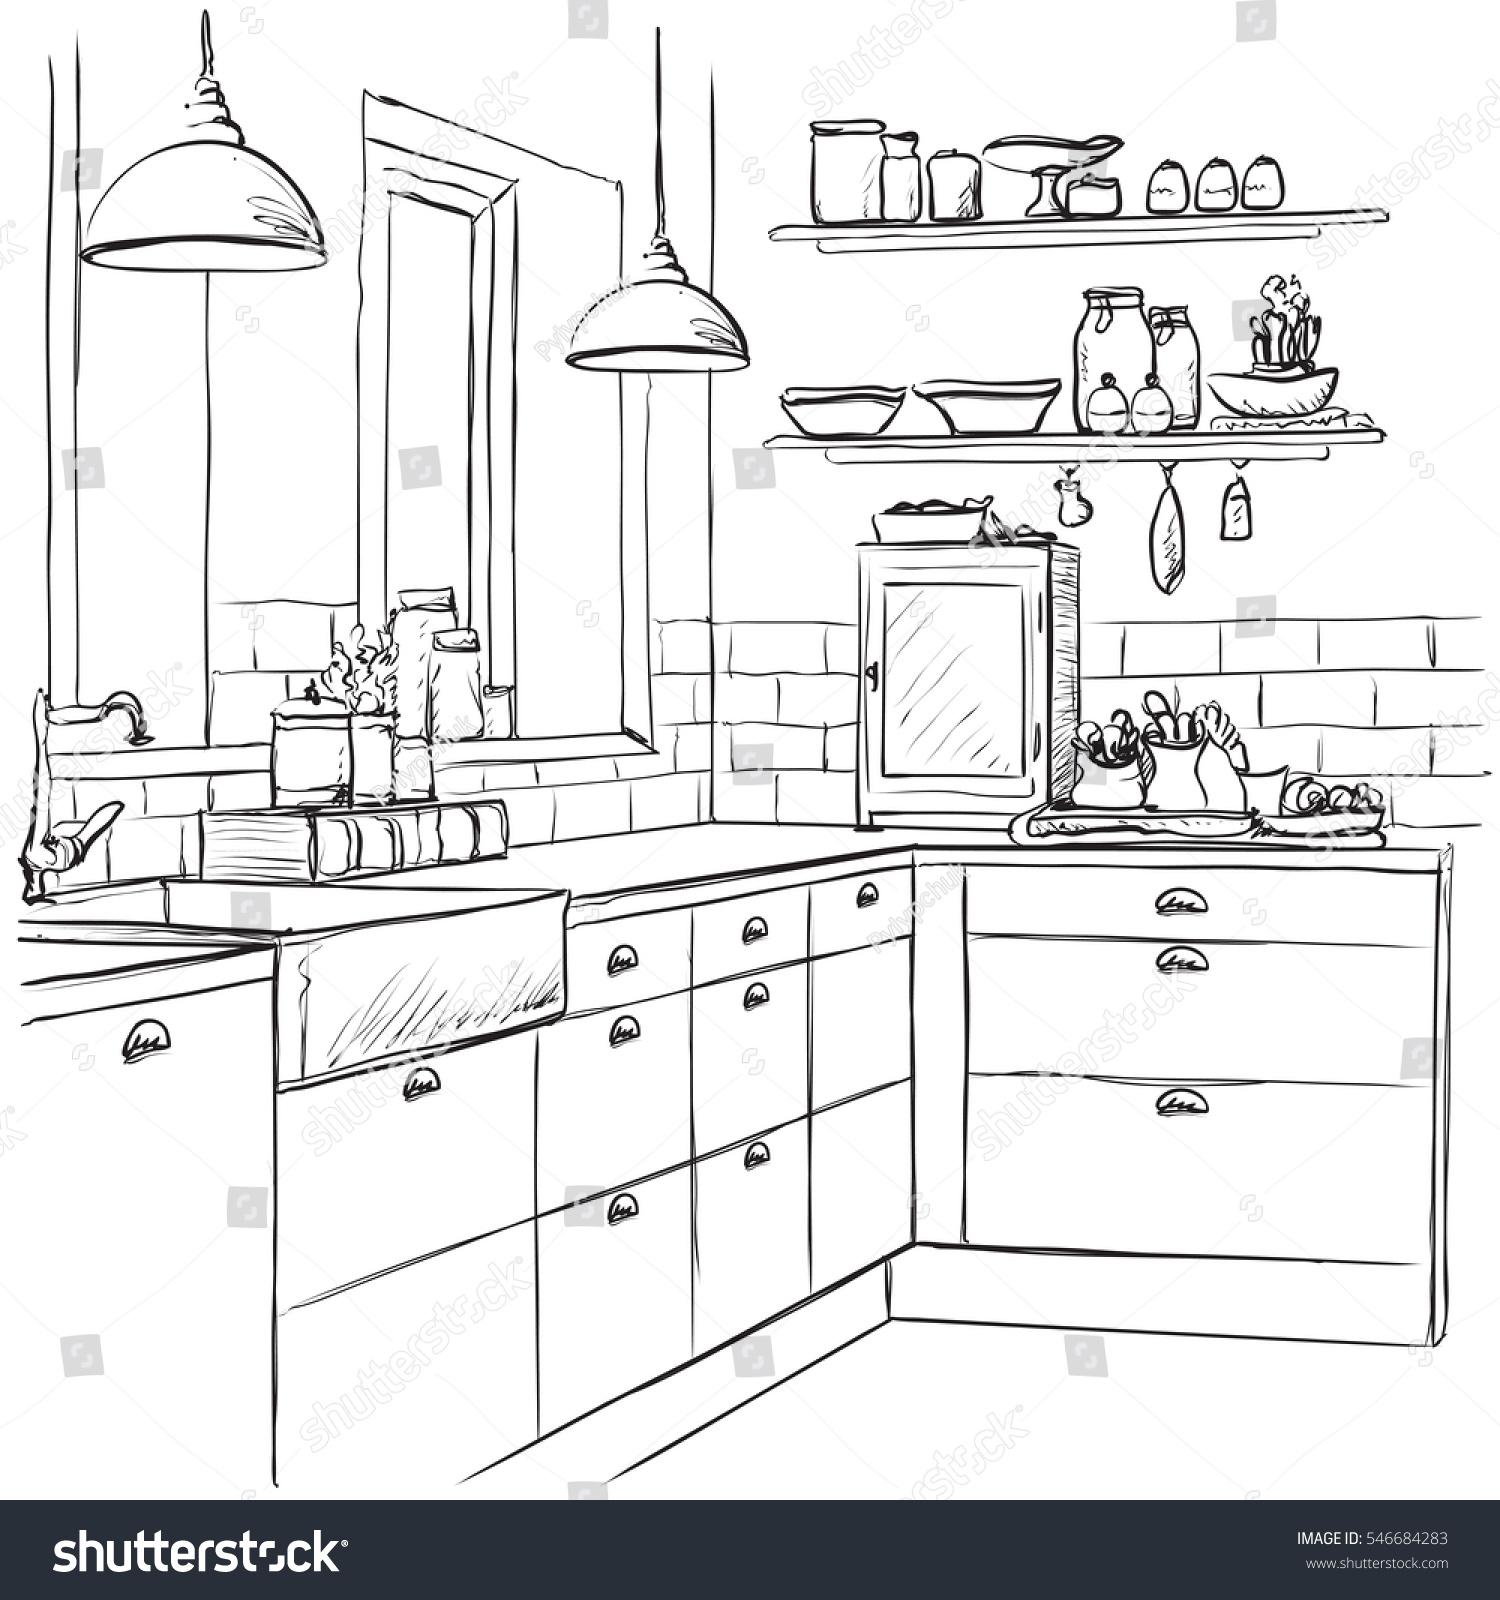 Kitchen Interior Drawing Vector Illustration Stock Vector